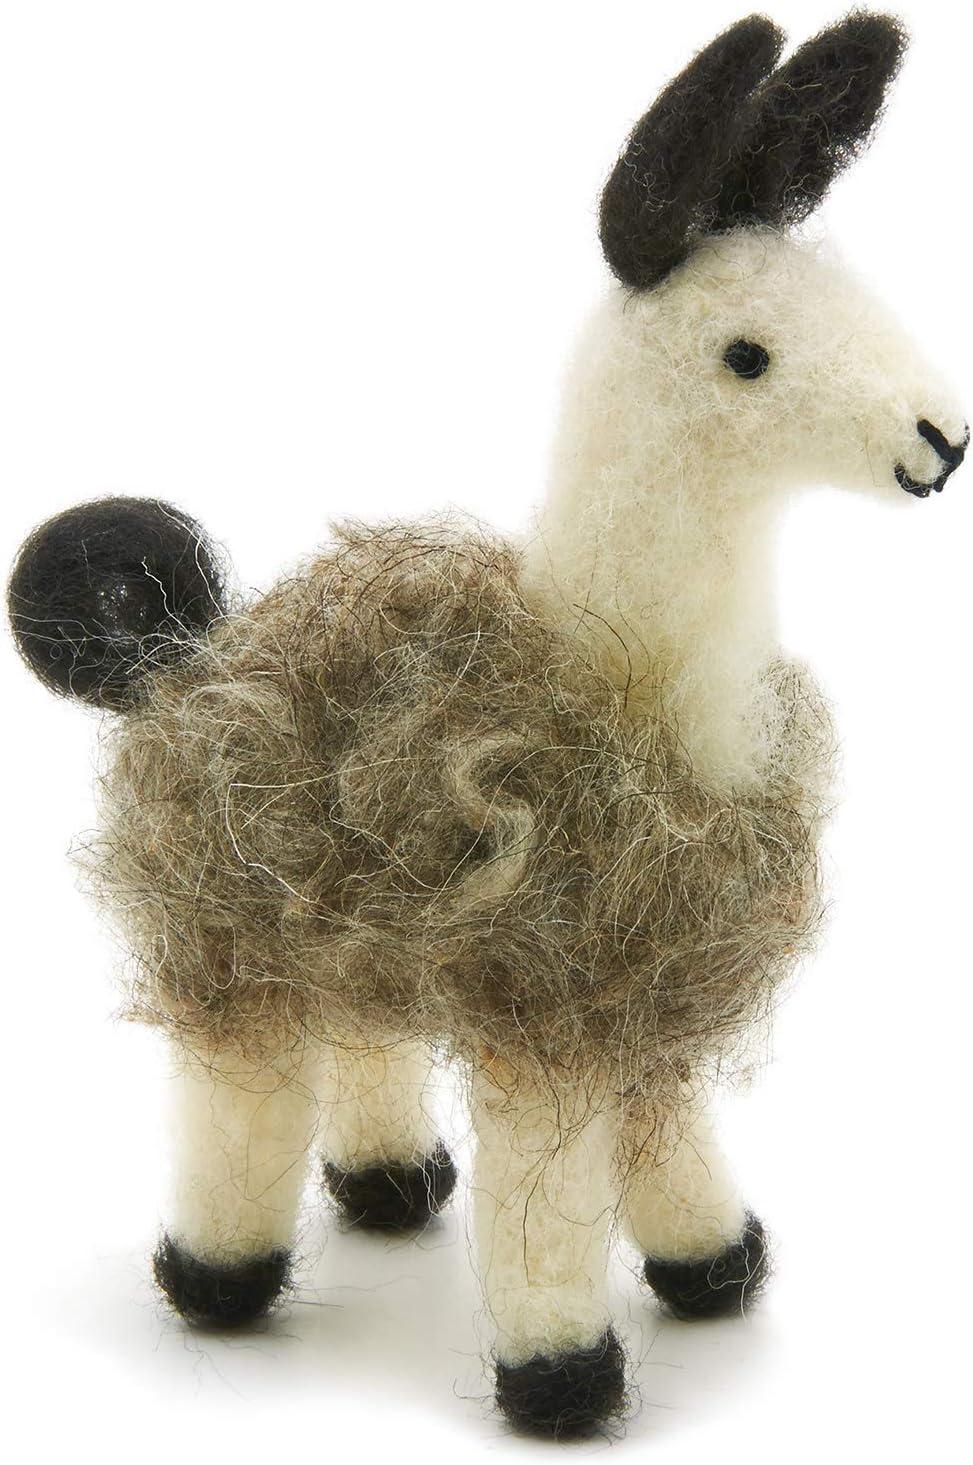 Felting Dreadlocks in Creamy Beige from Sassy 2 oz. Needle Felting Llama Roving for Spinning